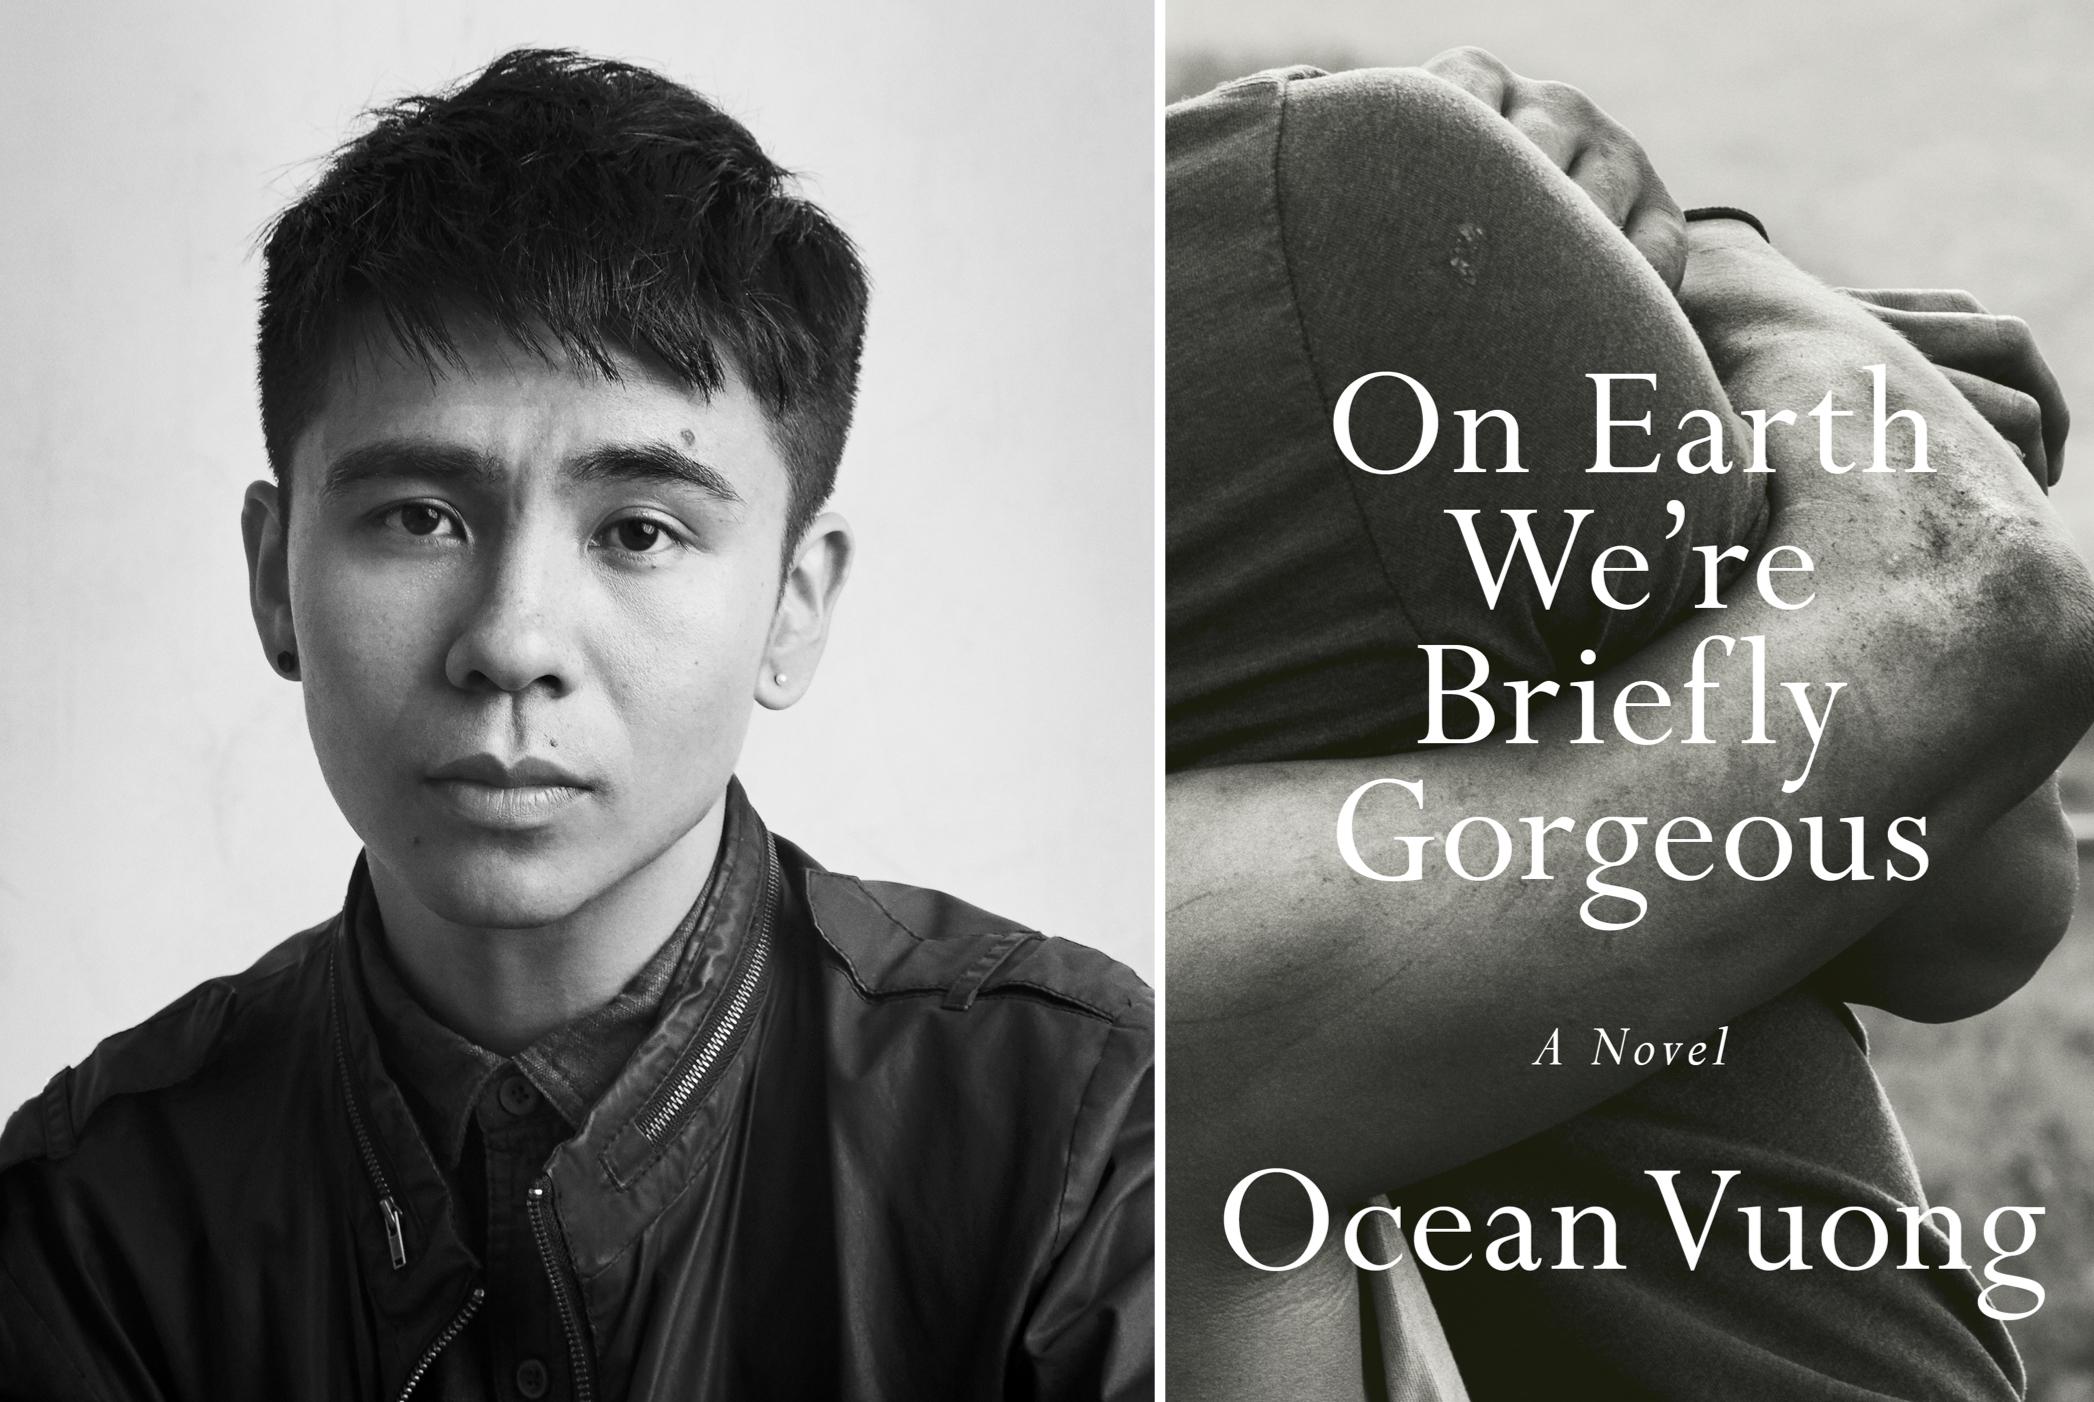 Ocean Vuong On Earth We're Briefly Gorgeous: A Novel